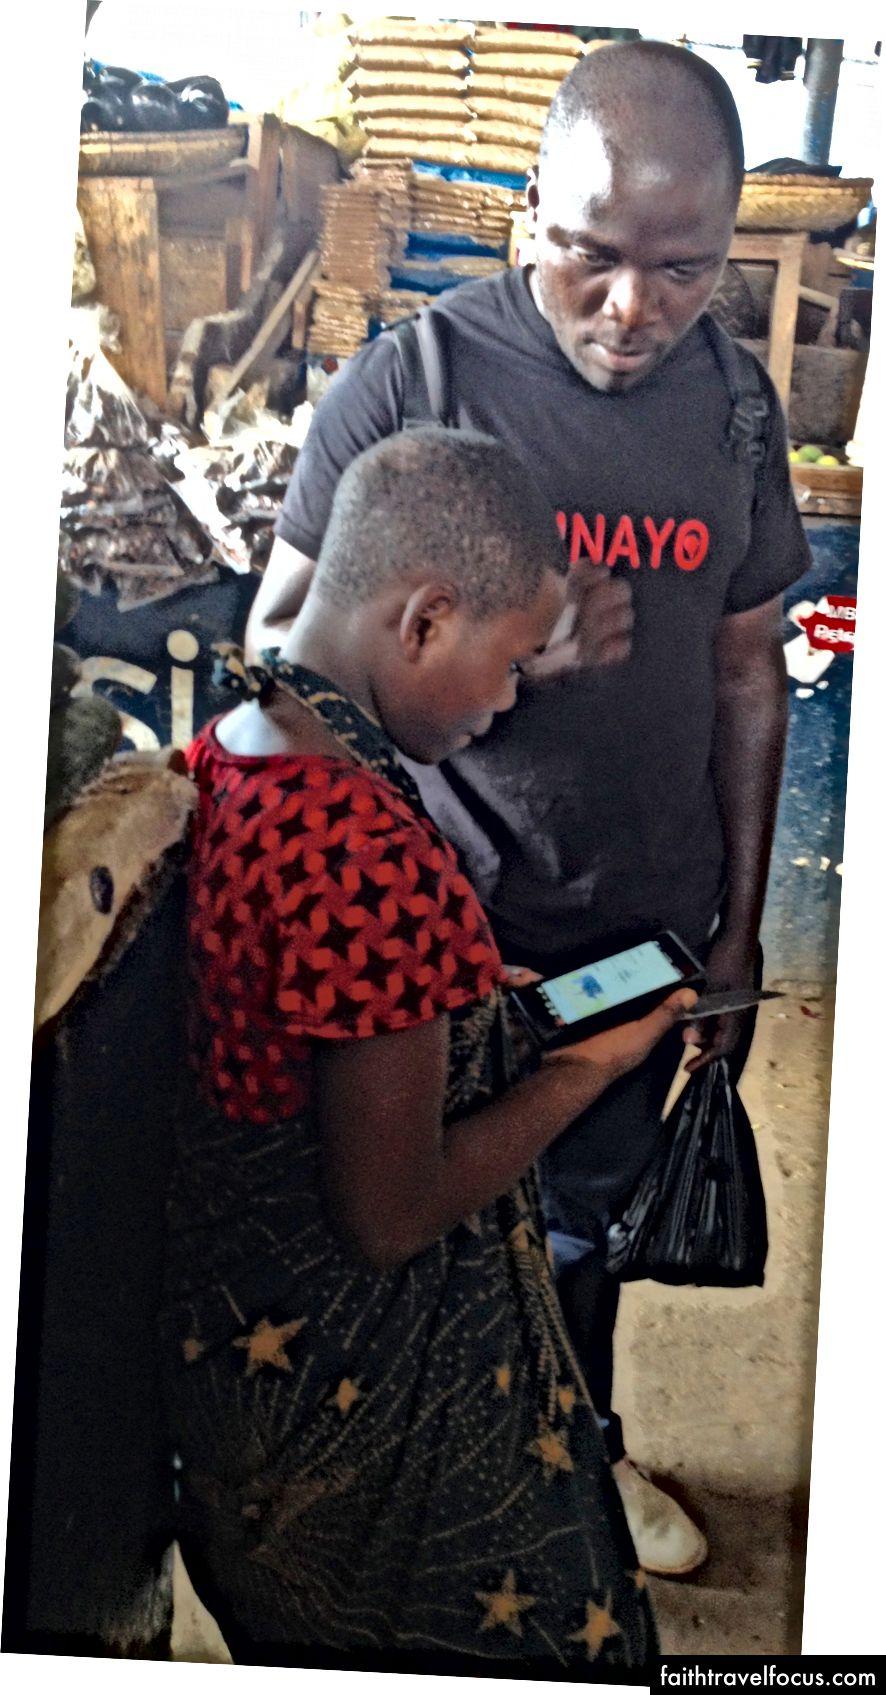 Član ekipe NINAYO Kassian Mwenda na prodajnem mestu NINAYO.com pokaže dekletu iz trgovine, kako najti boljše cene za svoje blago